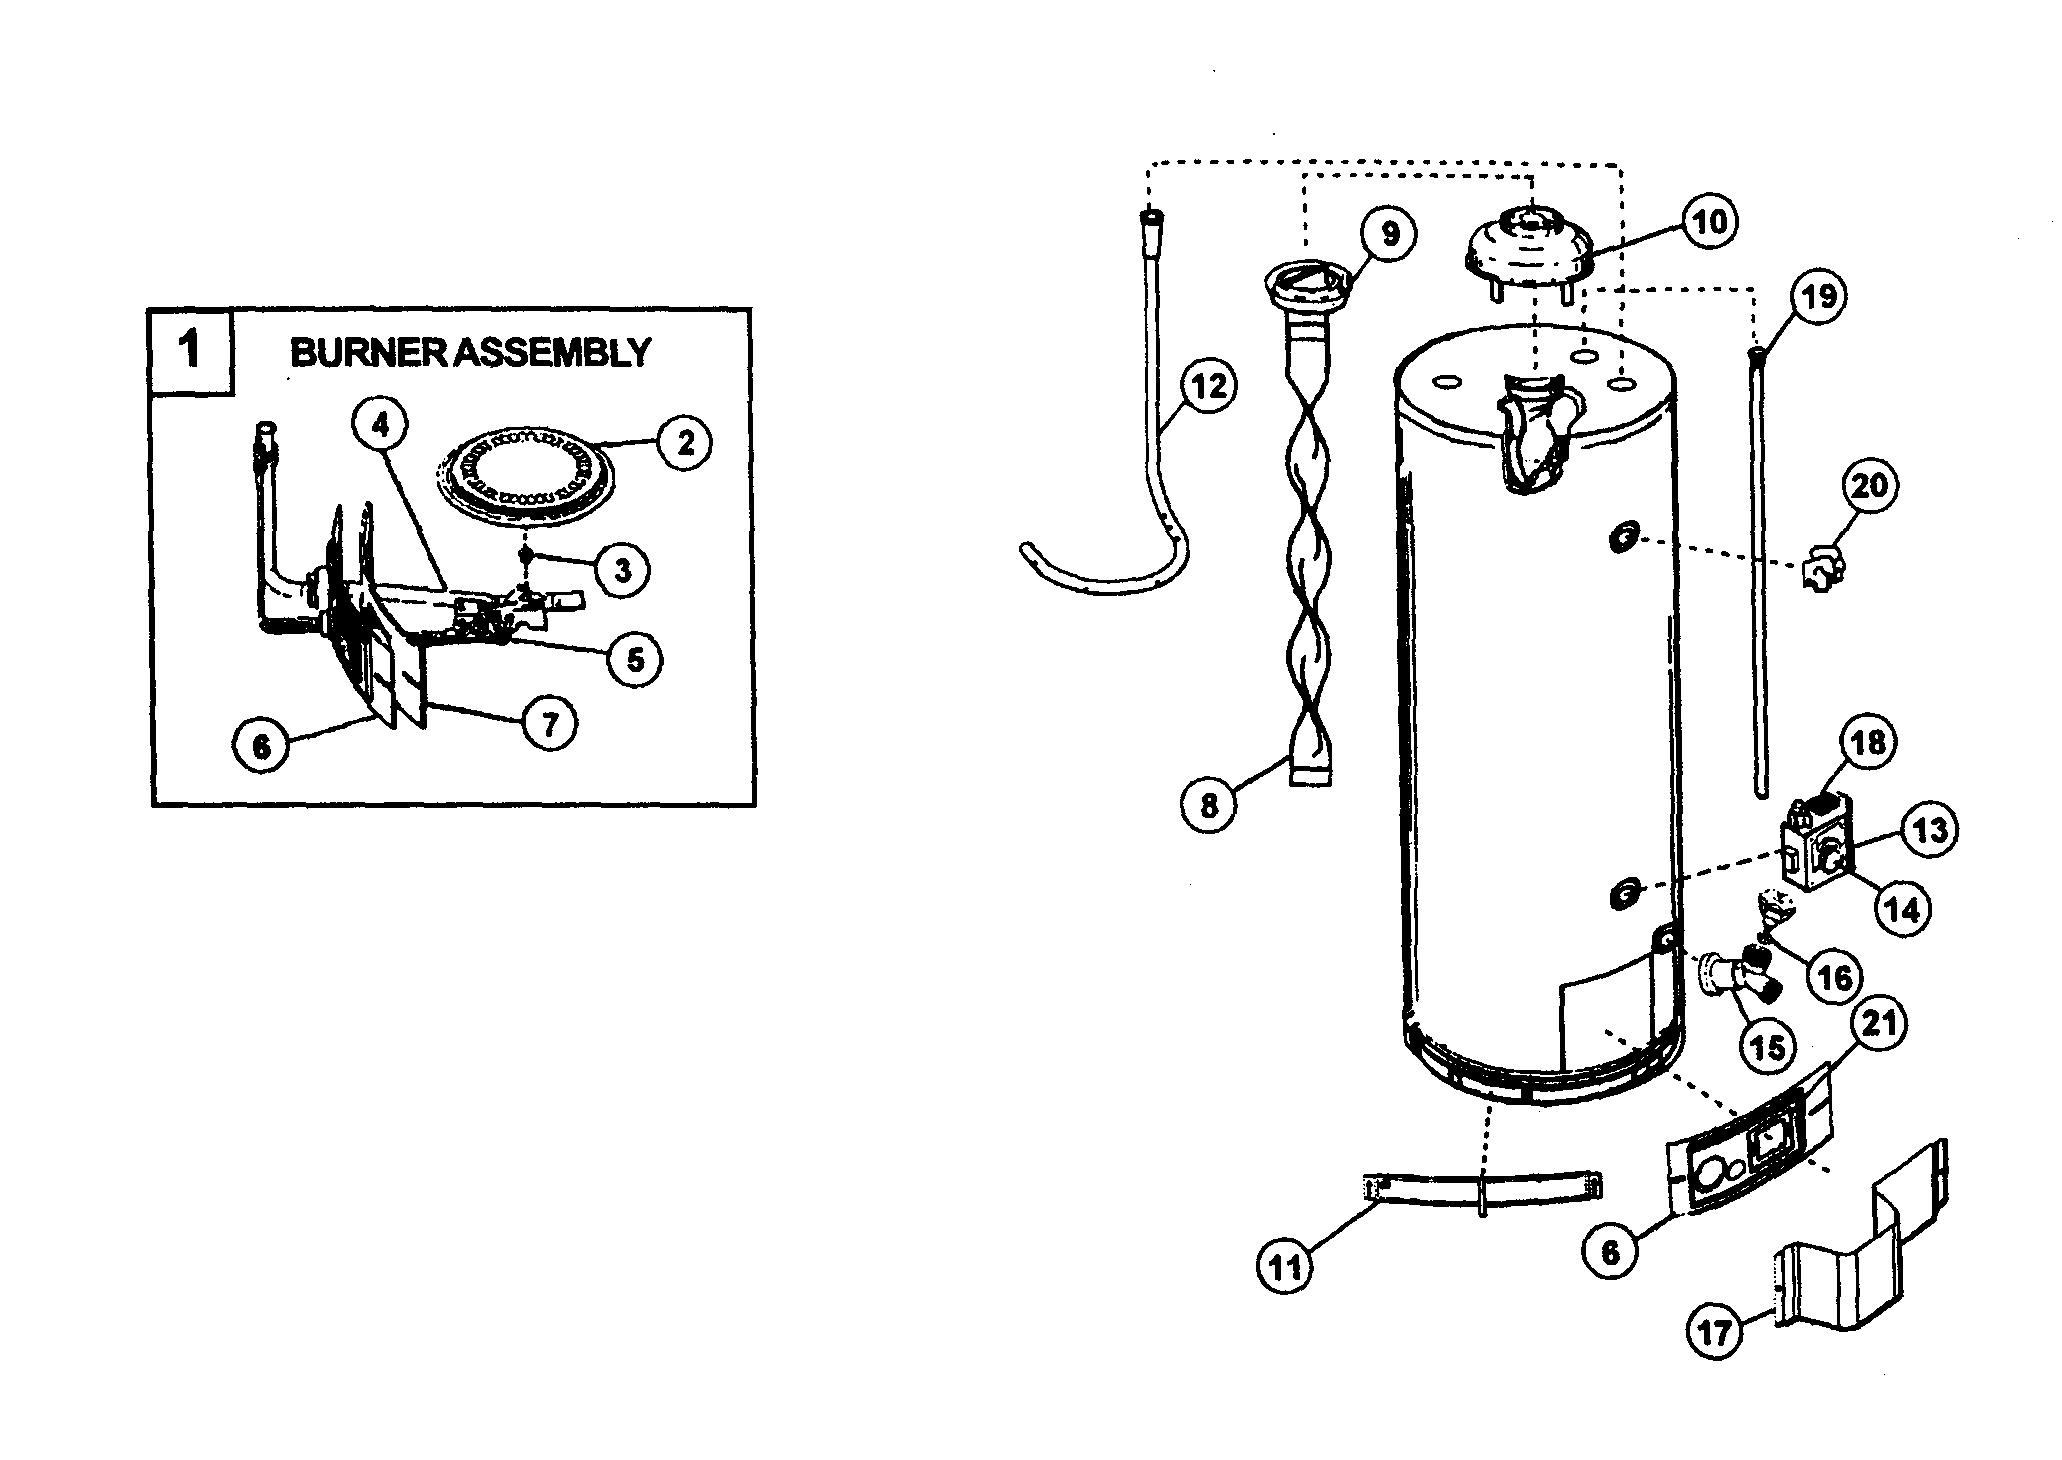 gas water heater diagram gg40t06avg01 water heater gas water heater schematic diagram gg40t06avg01 water heater